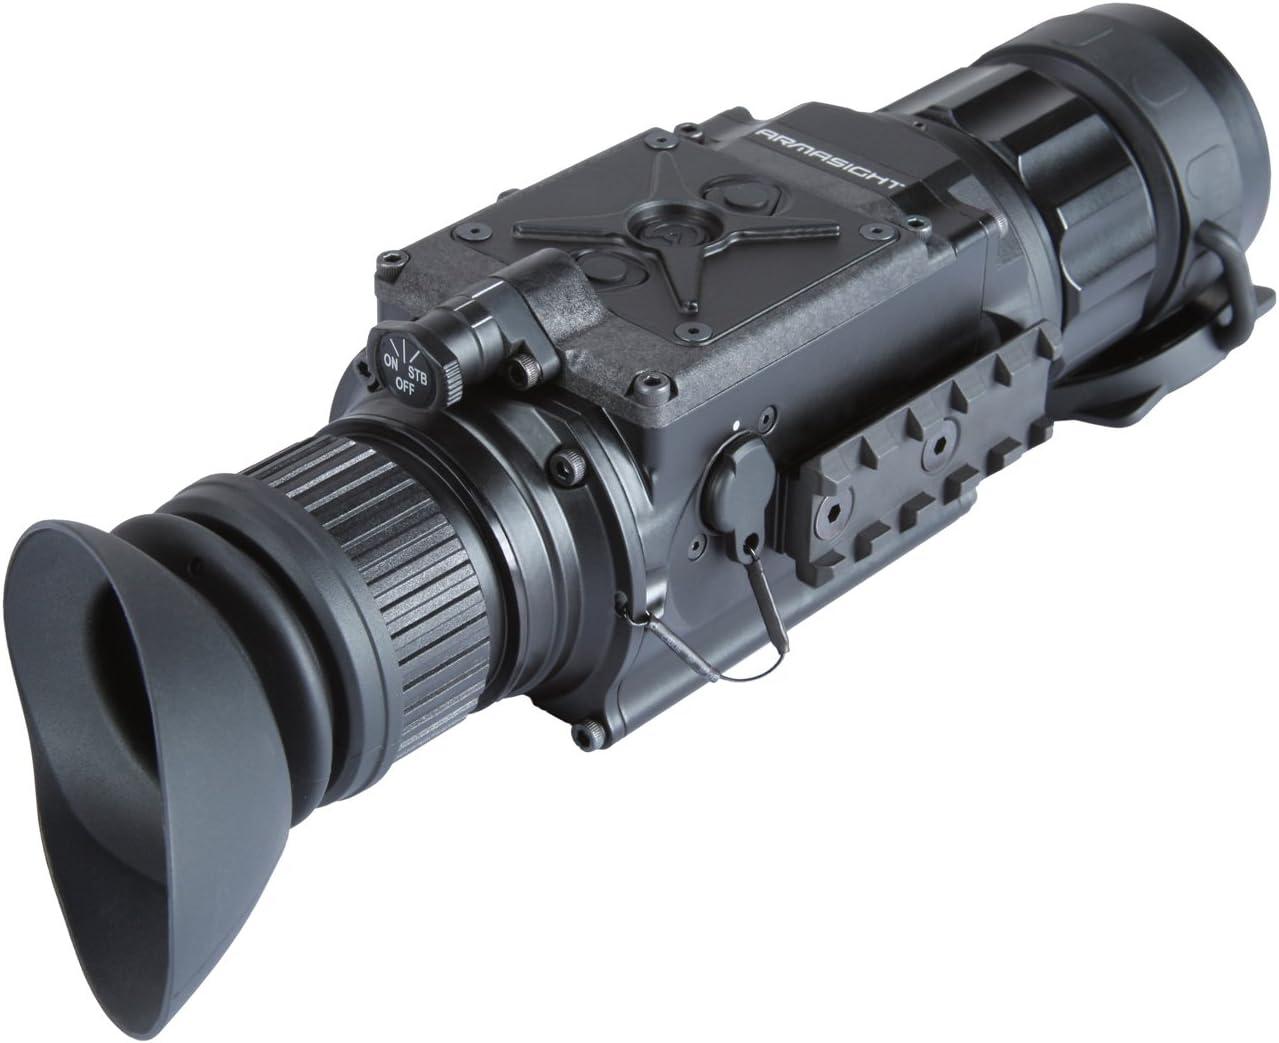 QFQ Binoculars 30/×60 Binoculars high-Definition Infrared Low-Light Night Vision Telescope